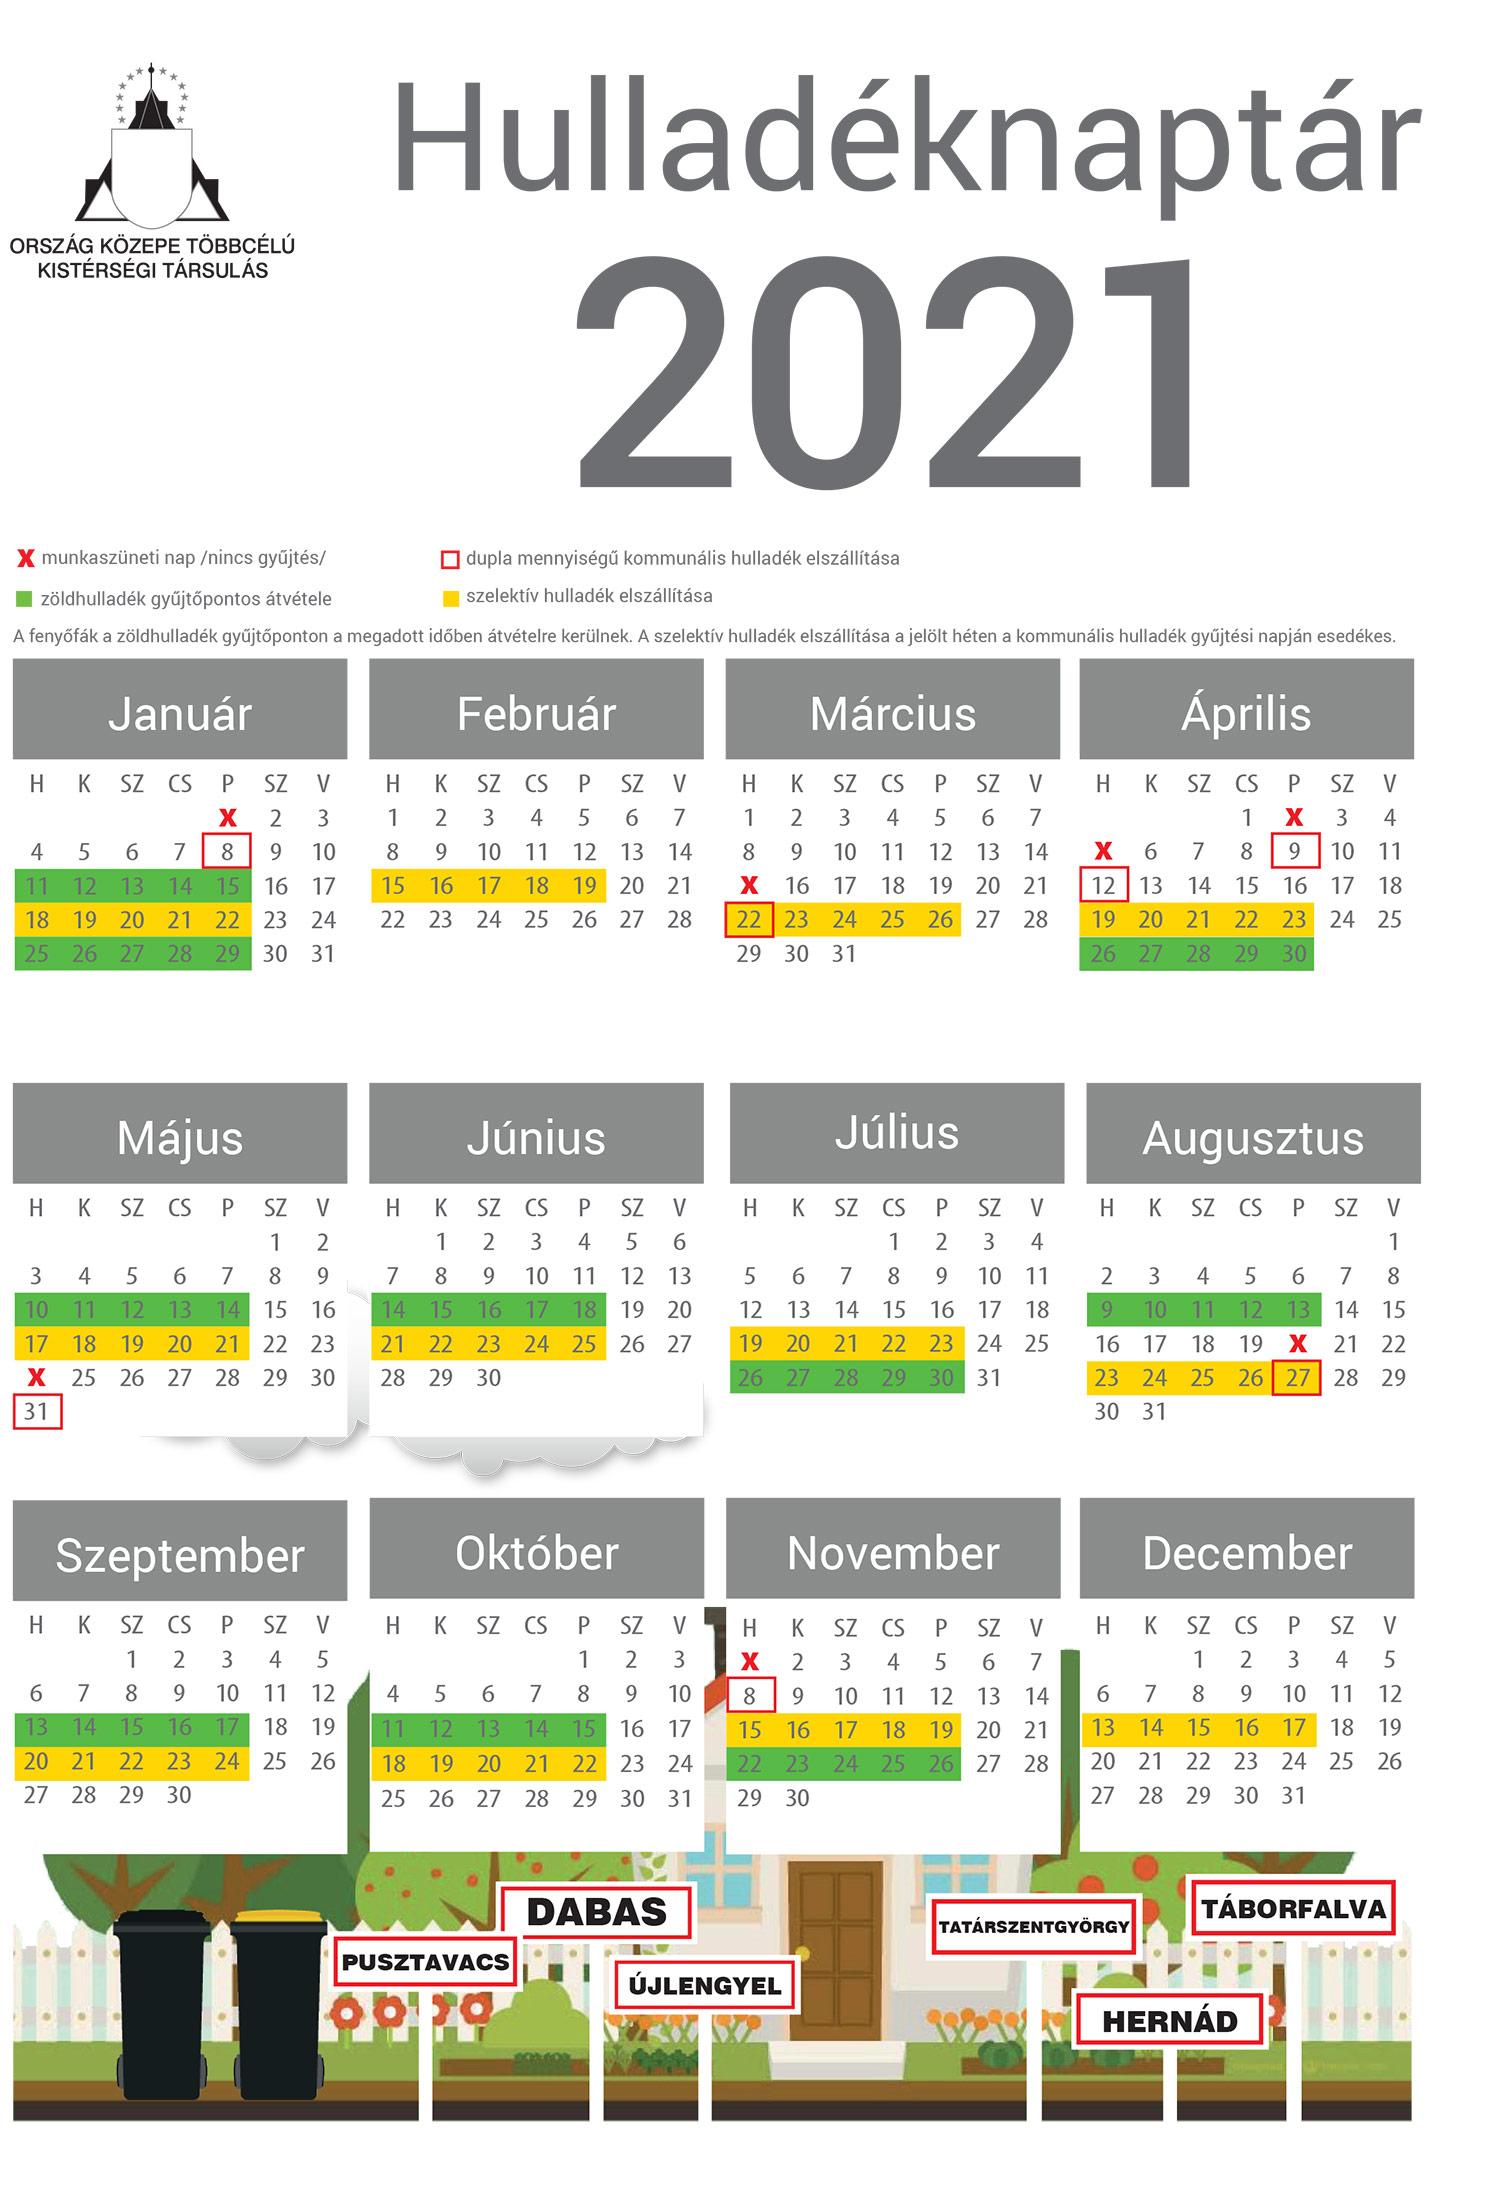 Hulladeknaptar 2021 1